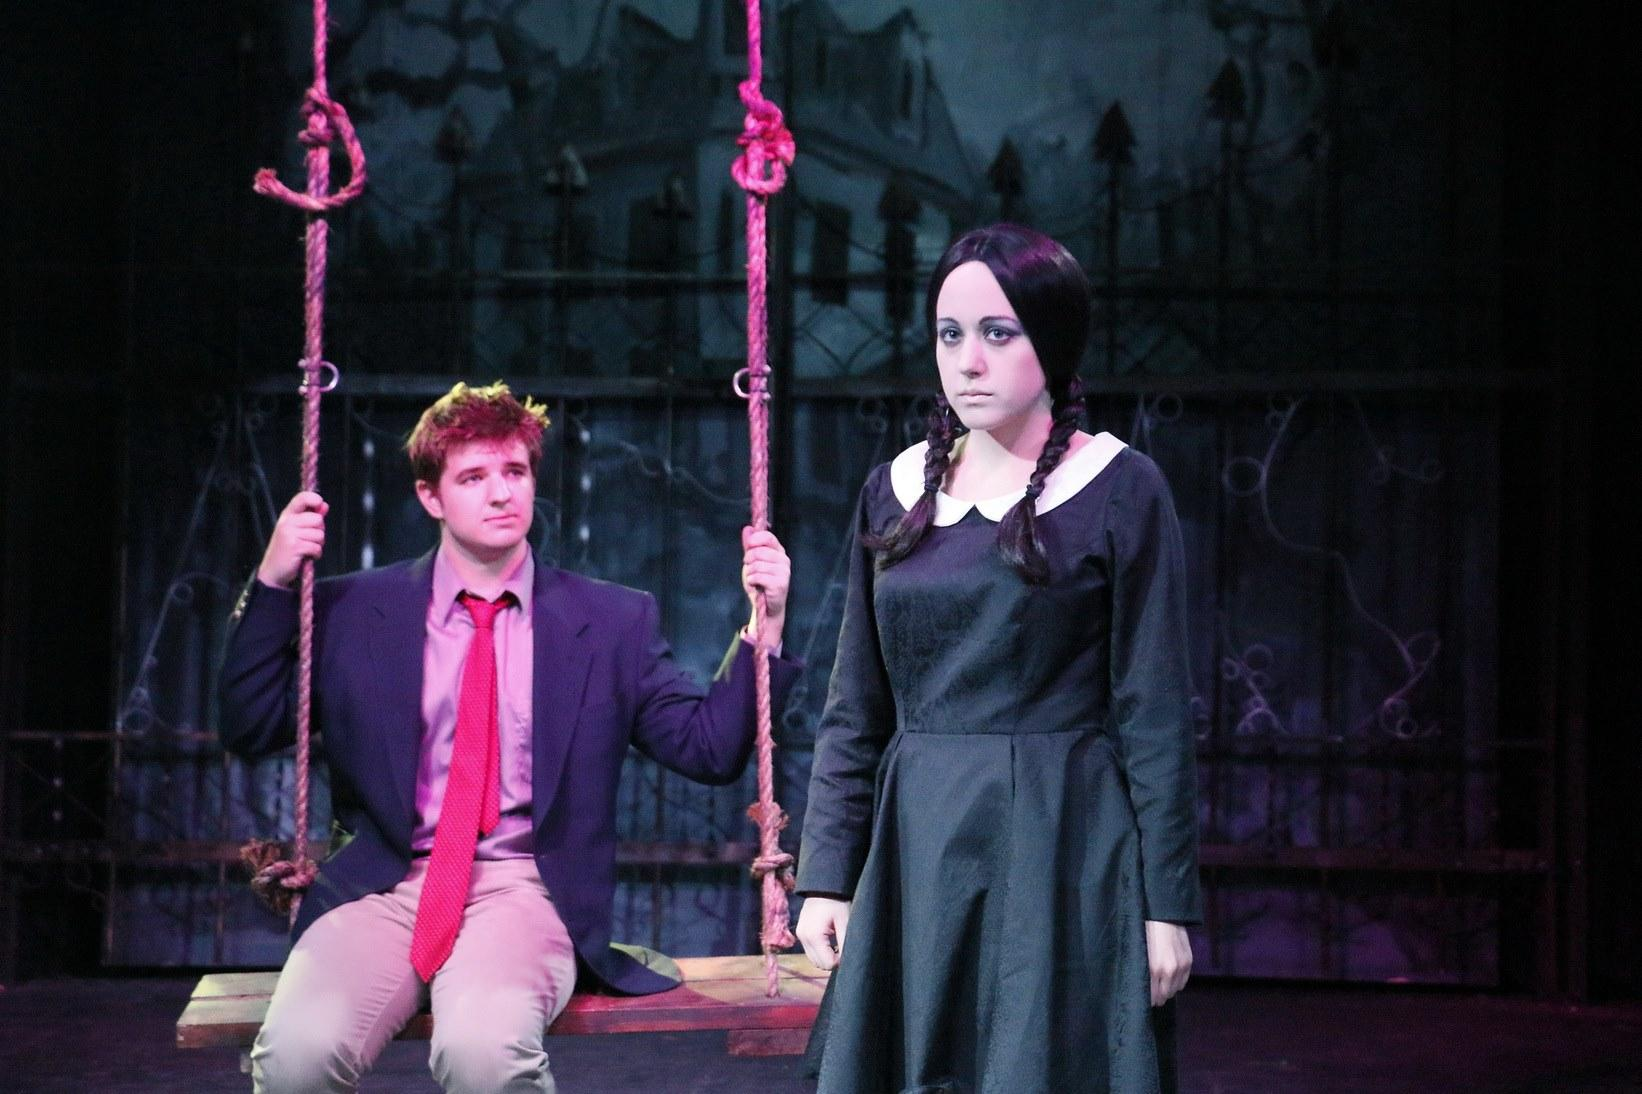 Addams family values wednesday boyfriend